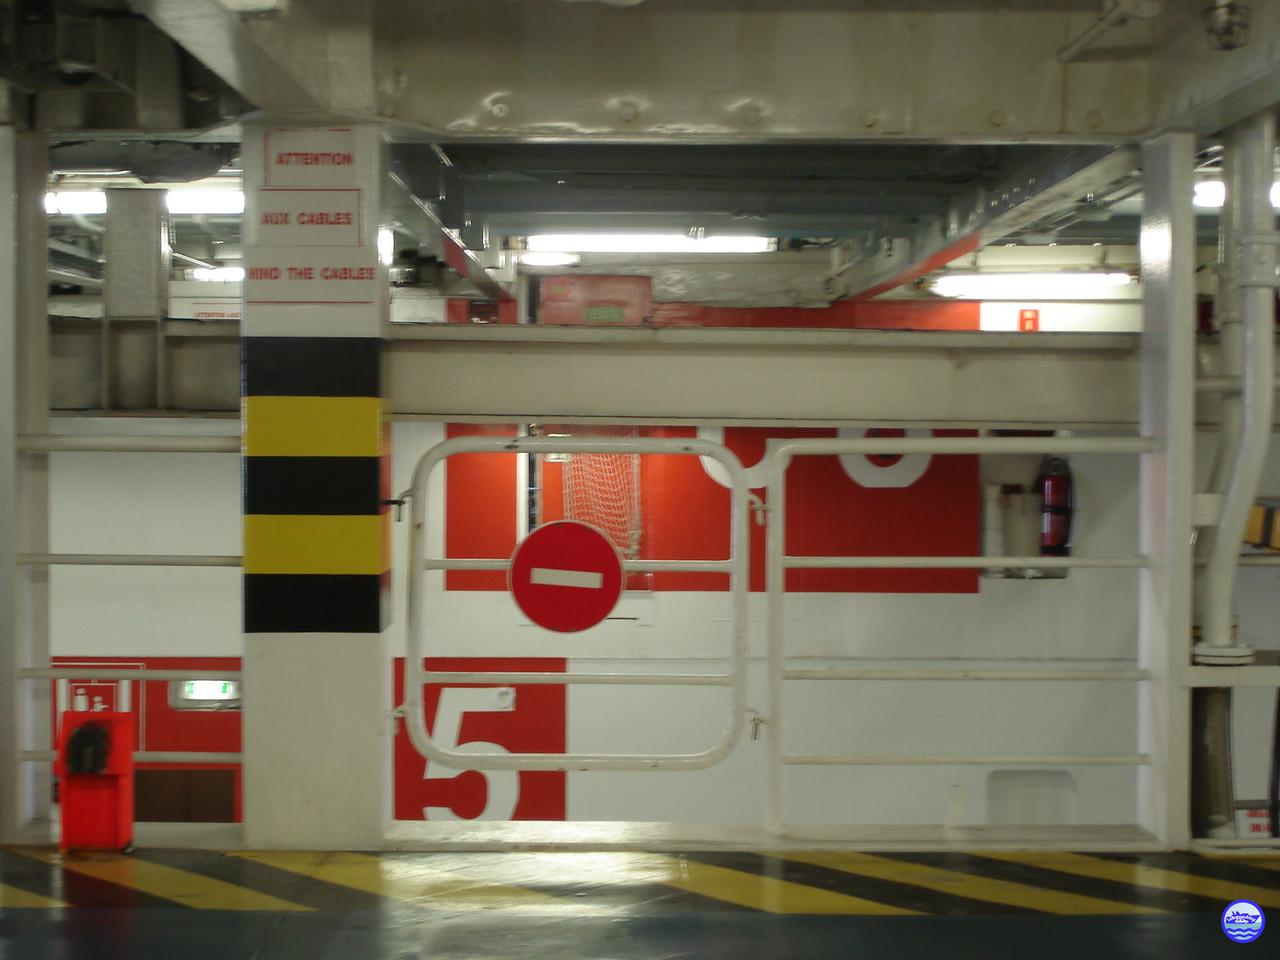 Pont garage 6 tribord